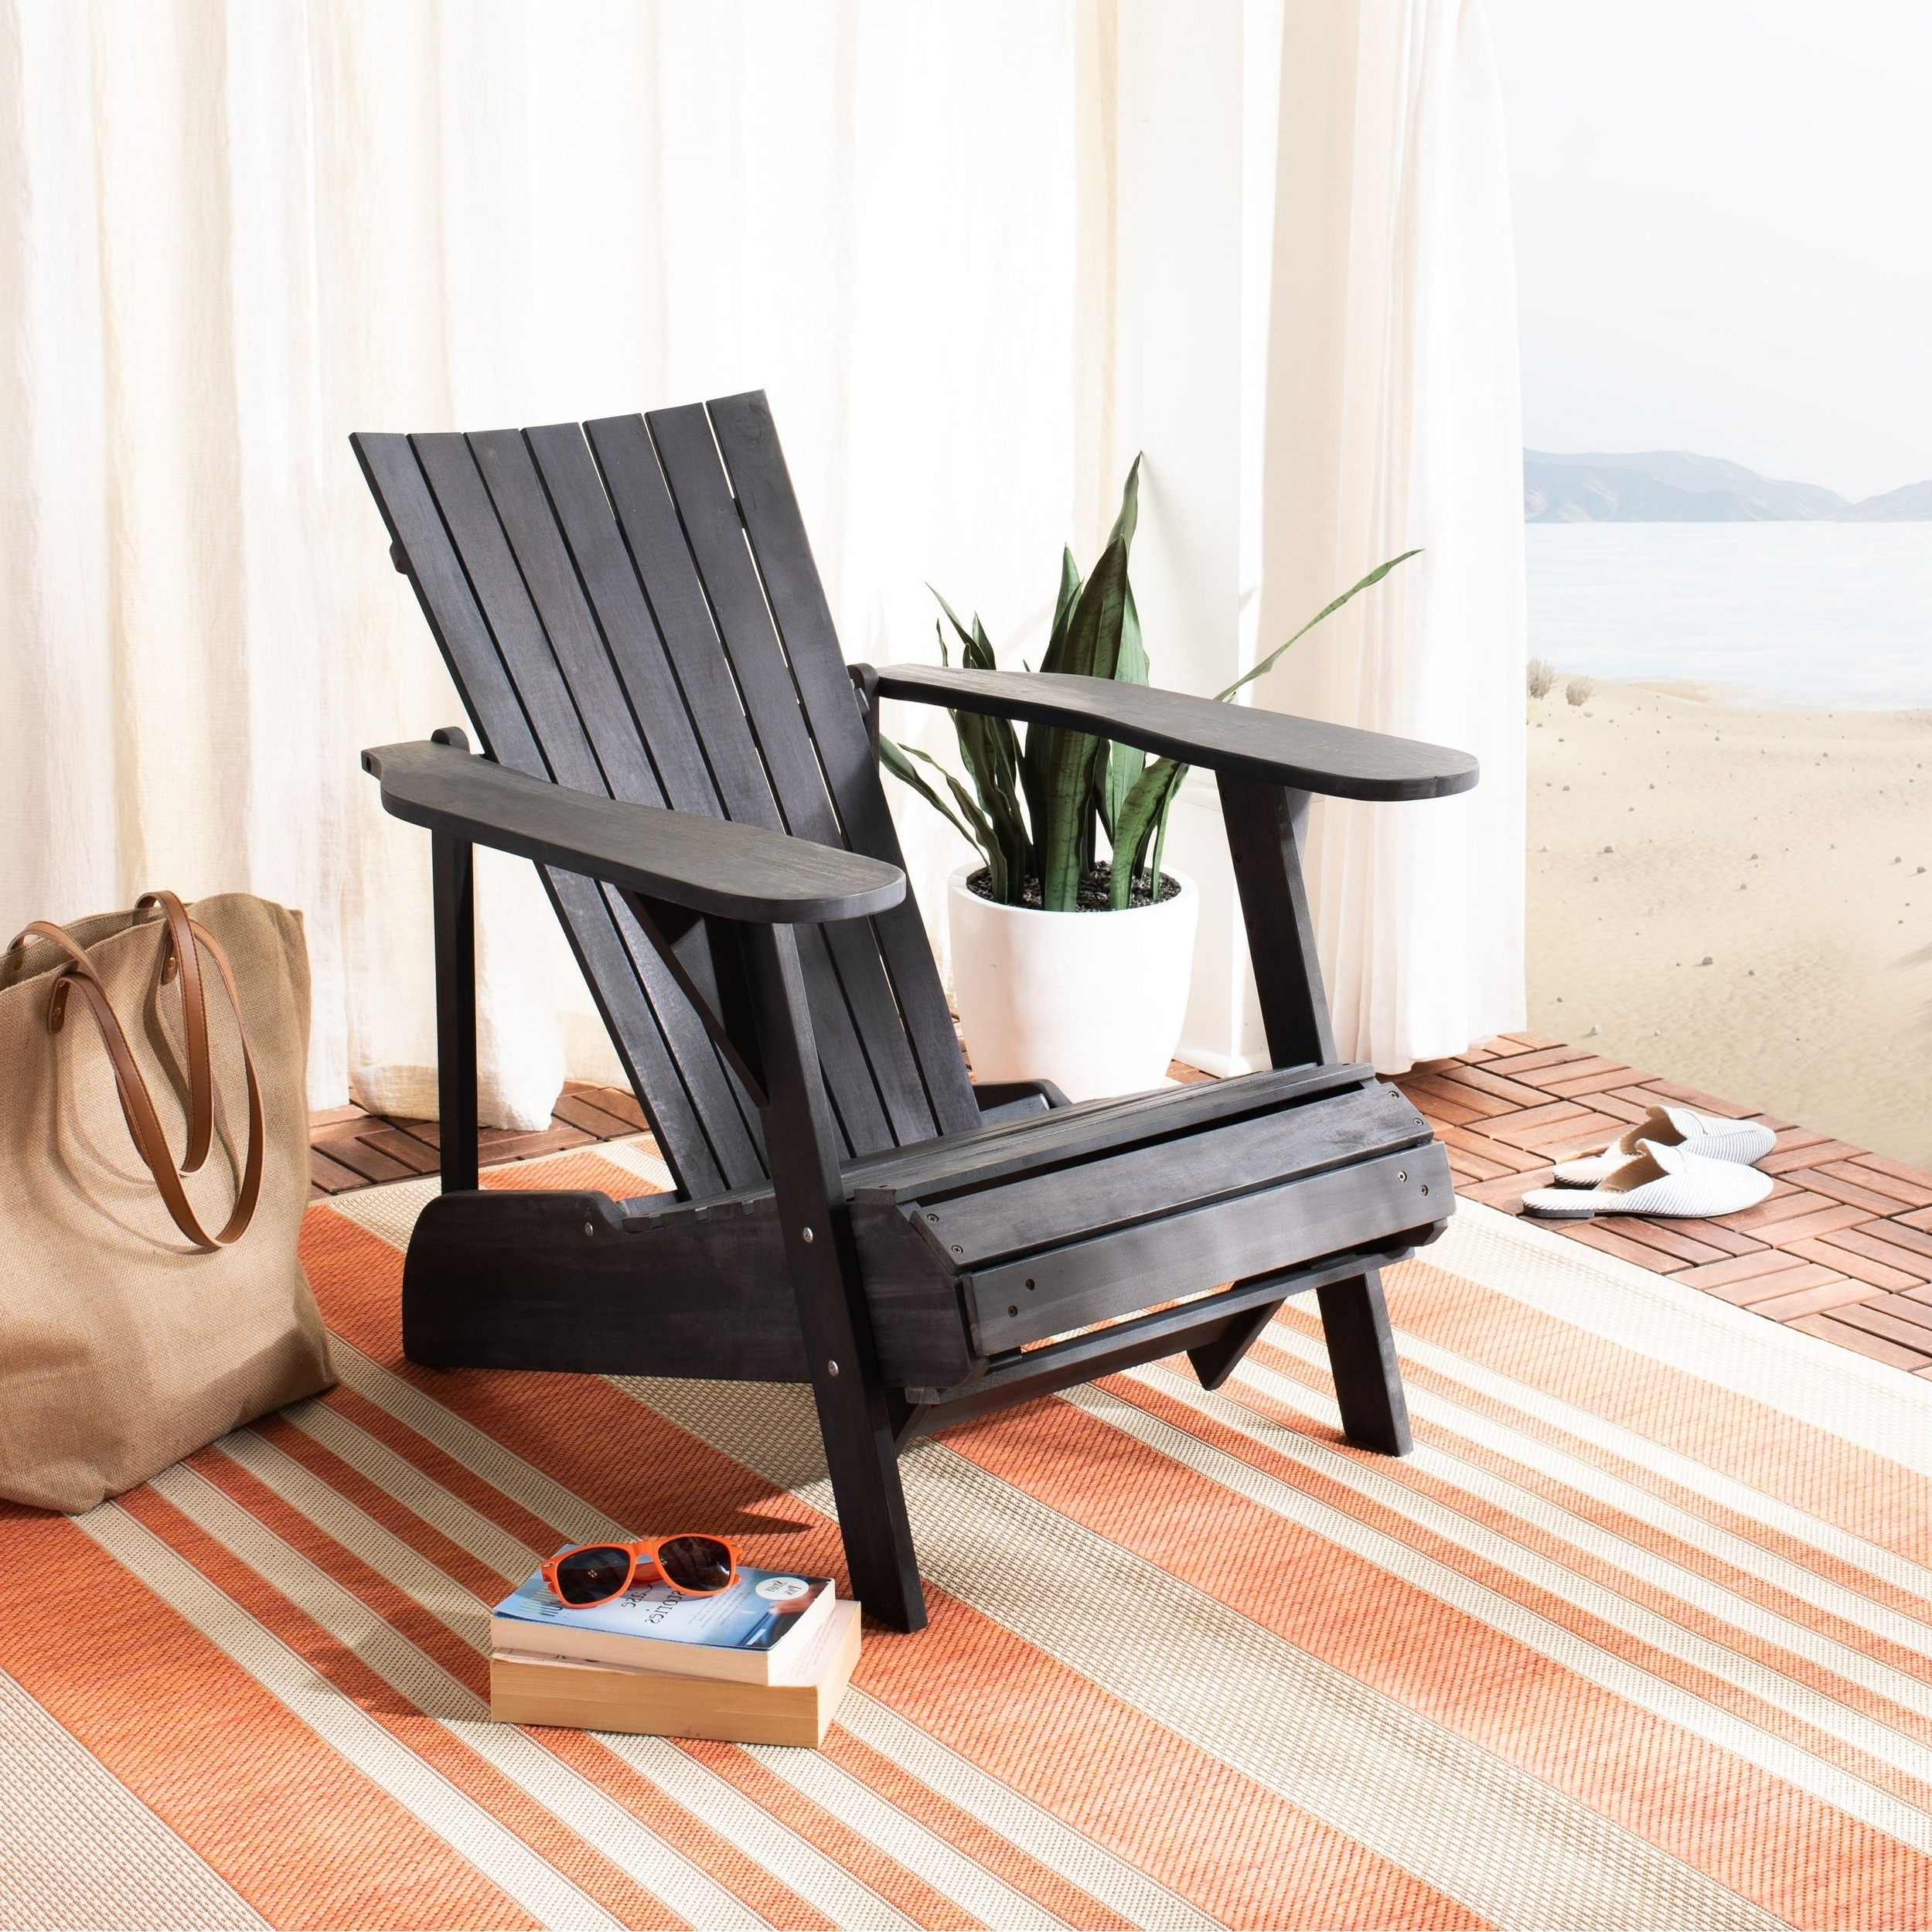 Latest Outdoor Living Manteca Dark Slate Lounge Chairs Regarding Safavieh Outdoor Living Merlin Adirondack Chair W (View 7 of 25)